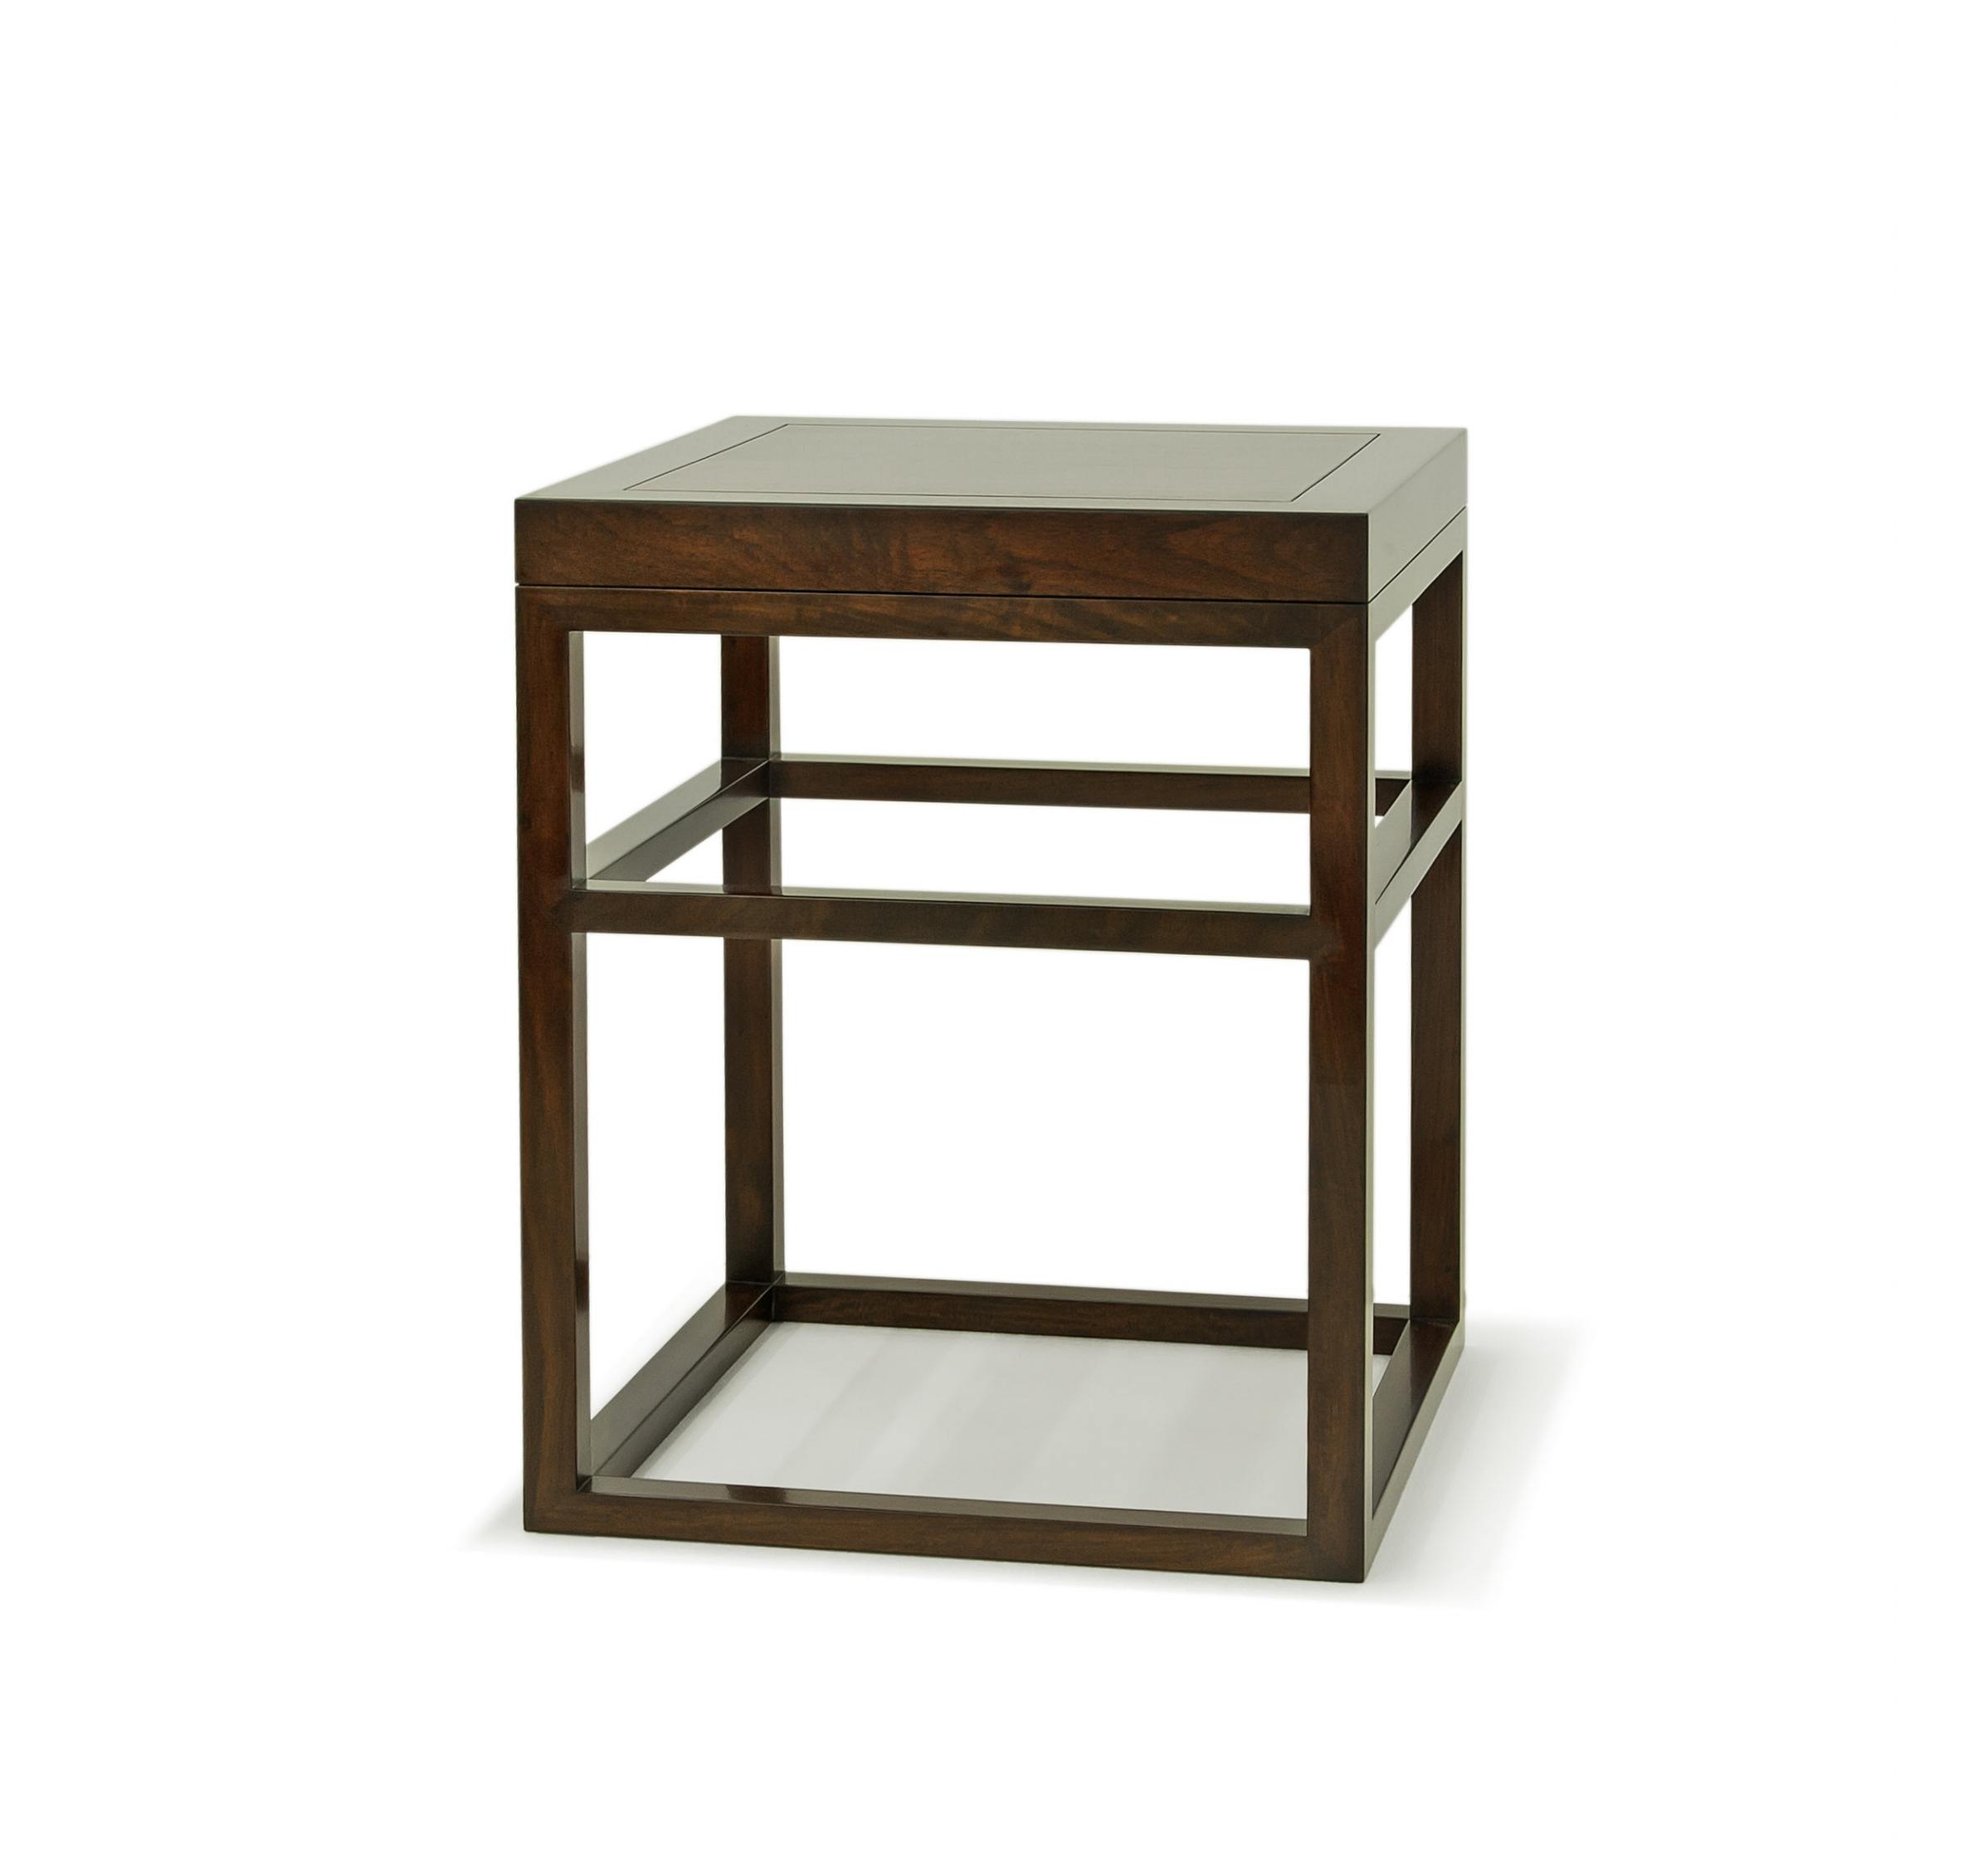 ....Bespoke Modern Chinese furniture : Low Table..特别定制现代中式家具: 低台....